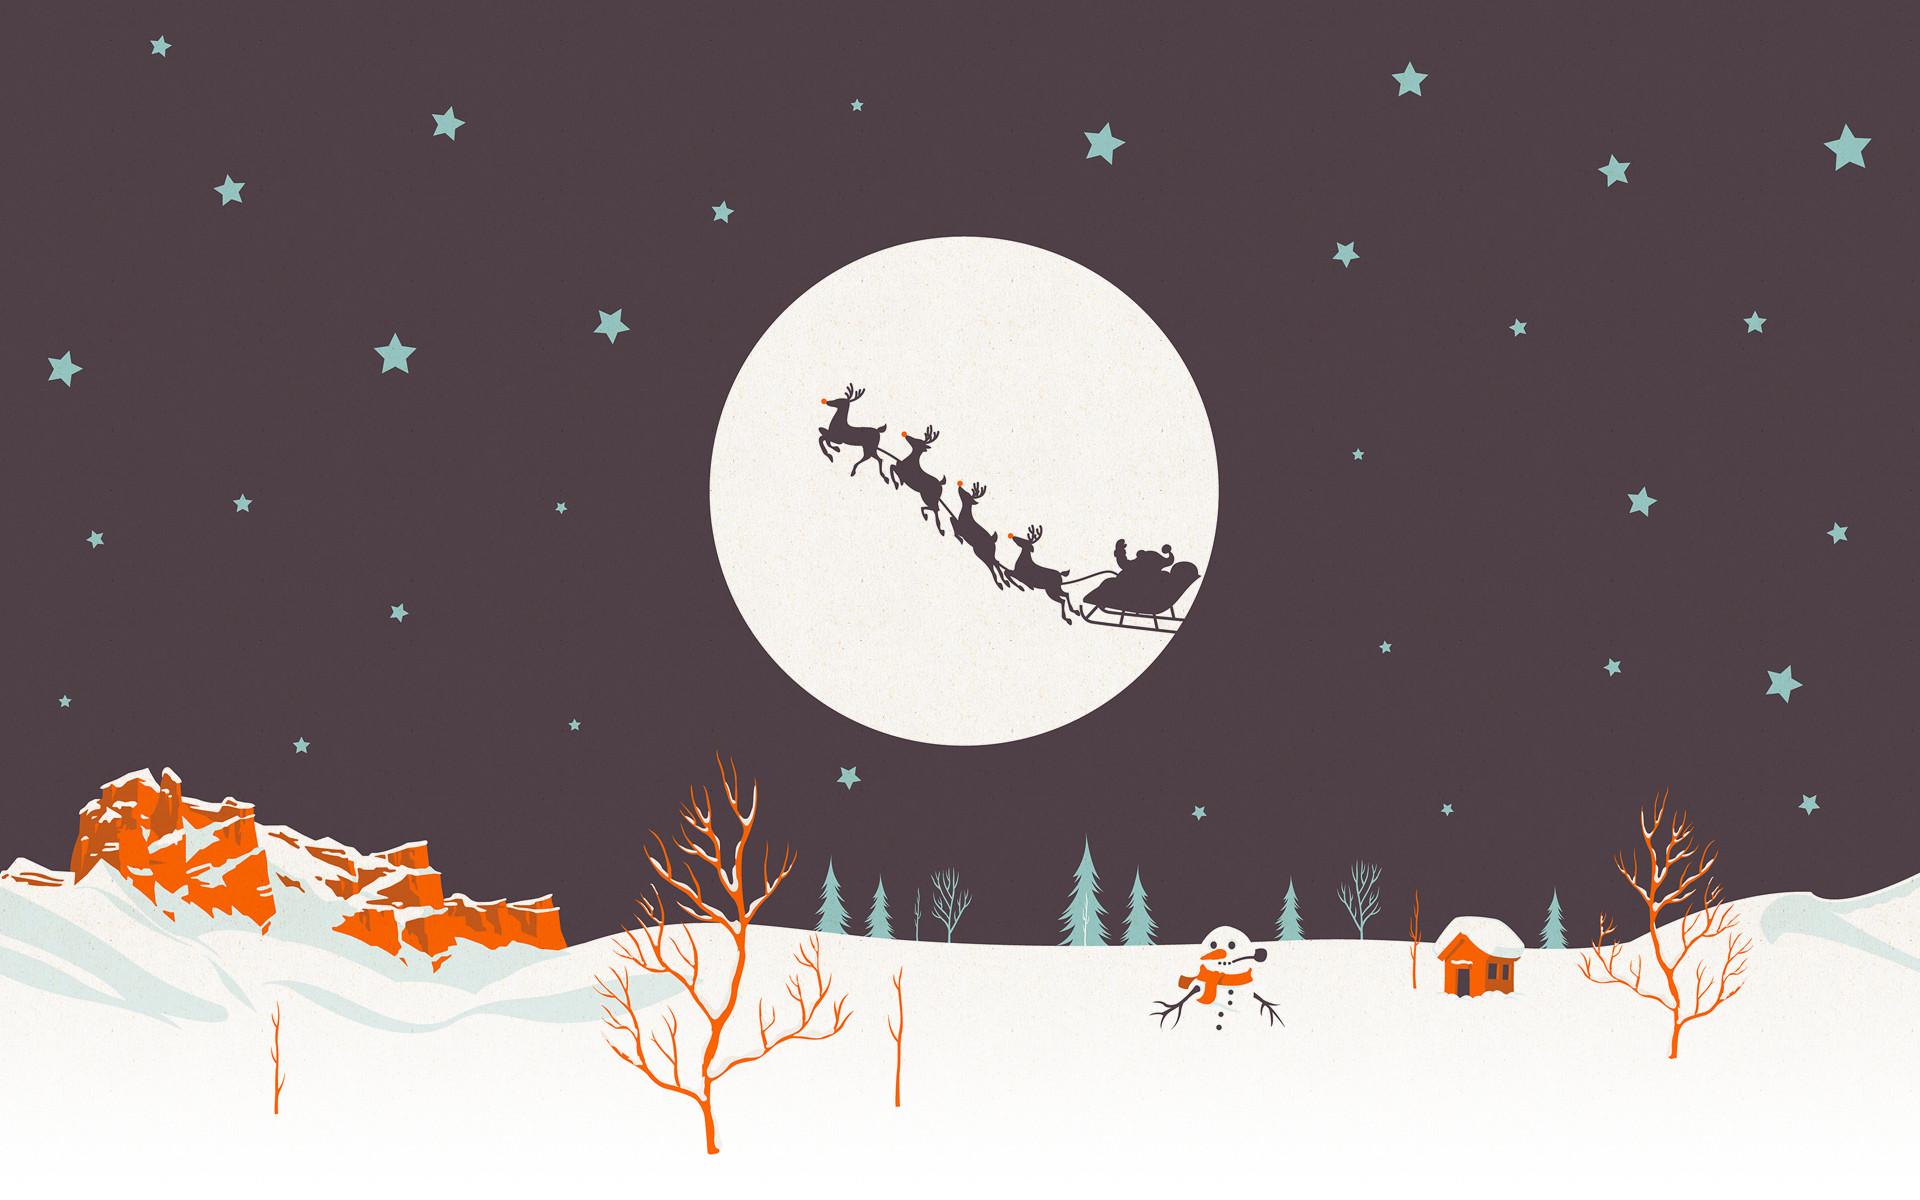 Winter Desktop Wallpaper Tumblr Posted By Sarah Peltier